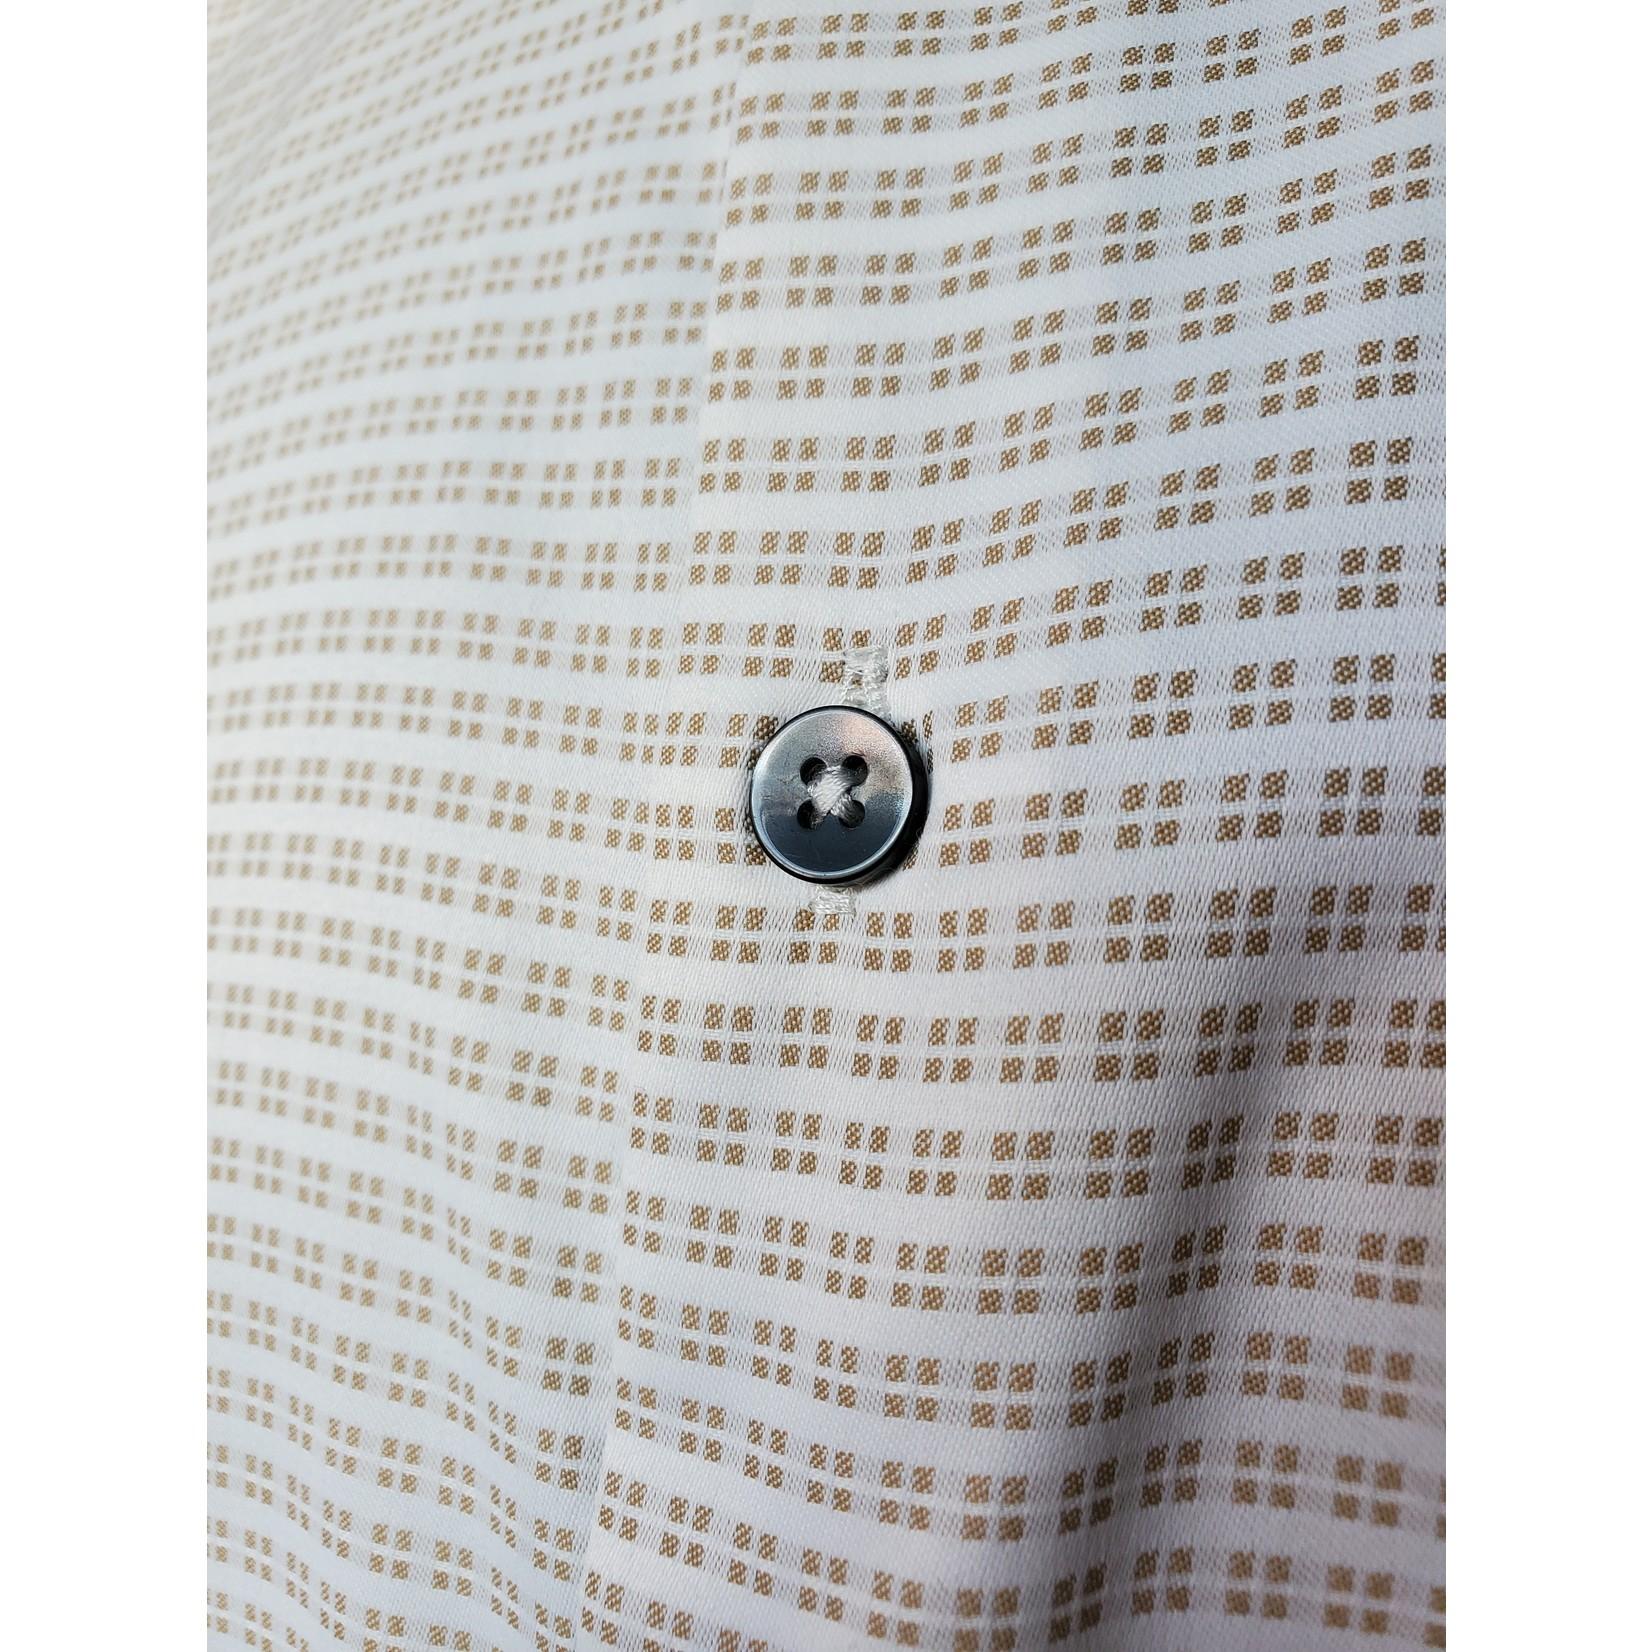 Versa MR6AD50 Brown Geometric Print Button-Up Short-Sleeve Shirt